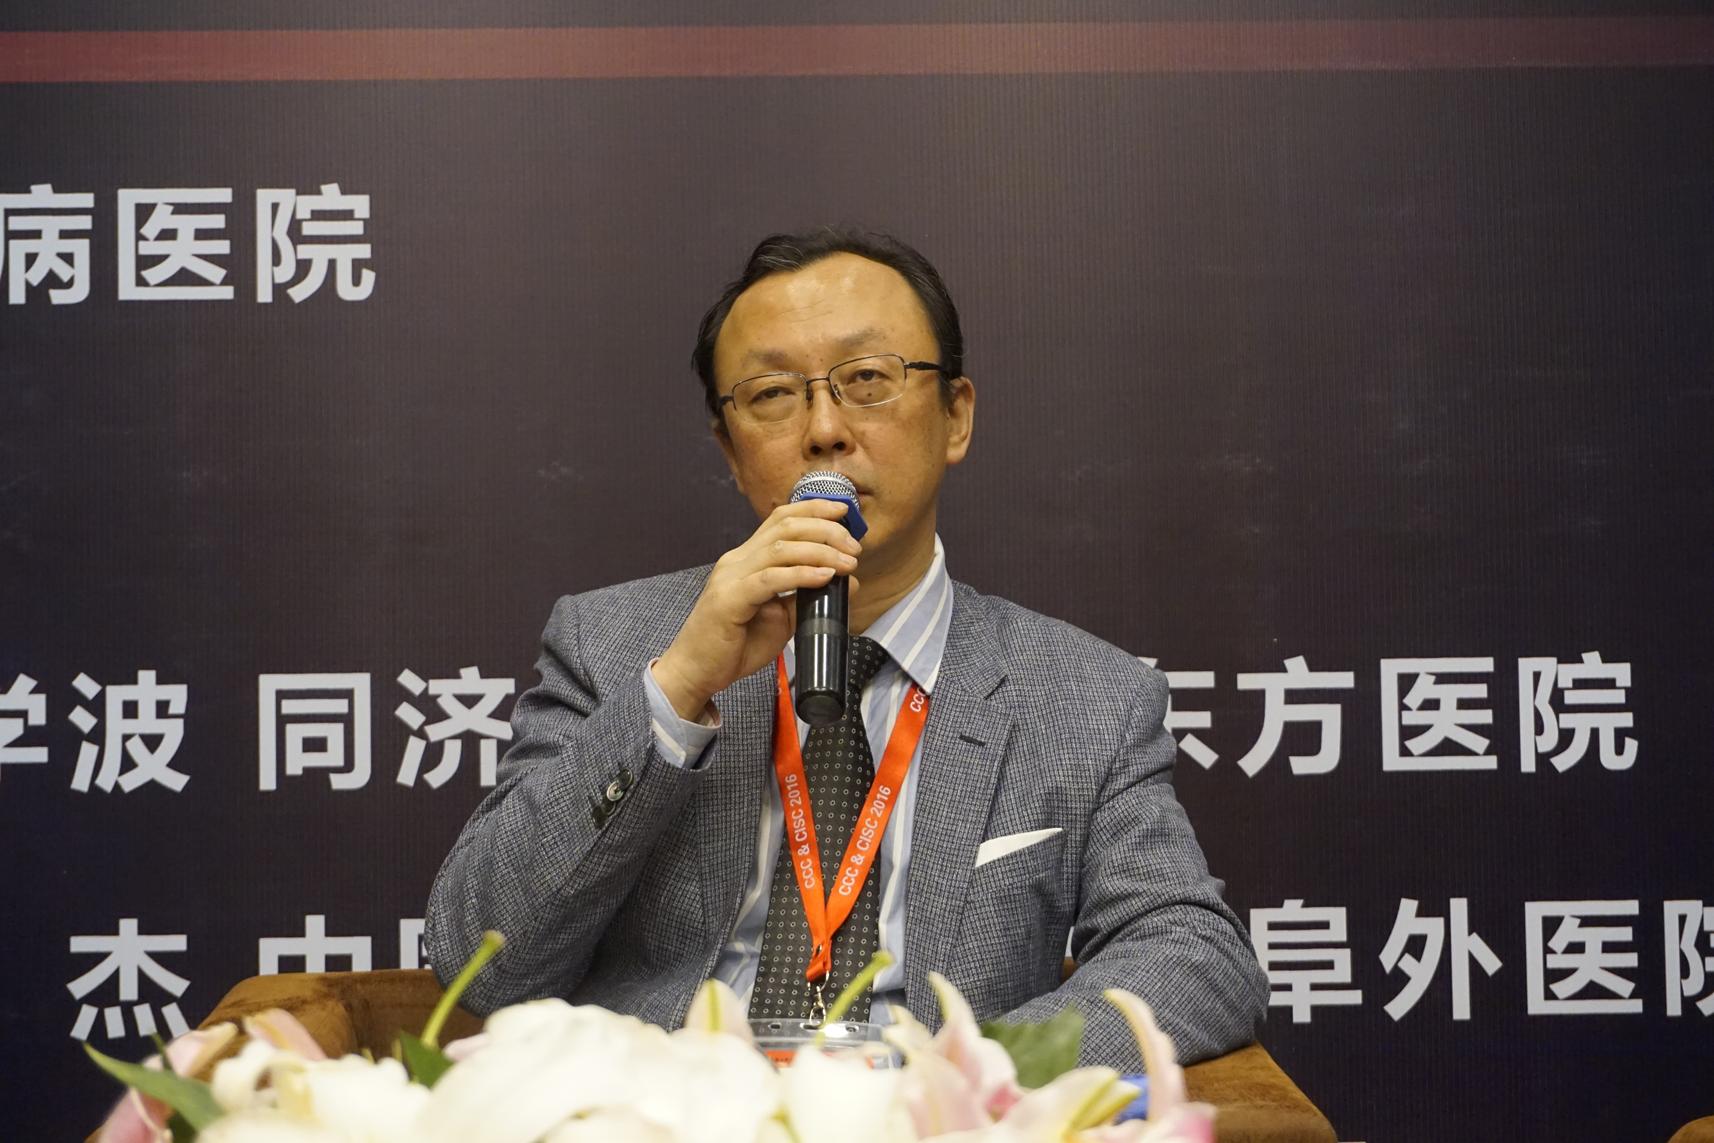 《INTRACORONARY ULTRASOUND》(冠状动脉内超声)中文版在国内出版发行